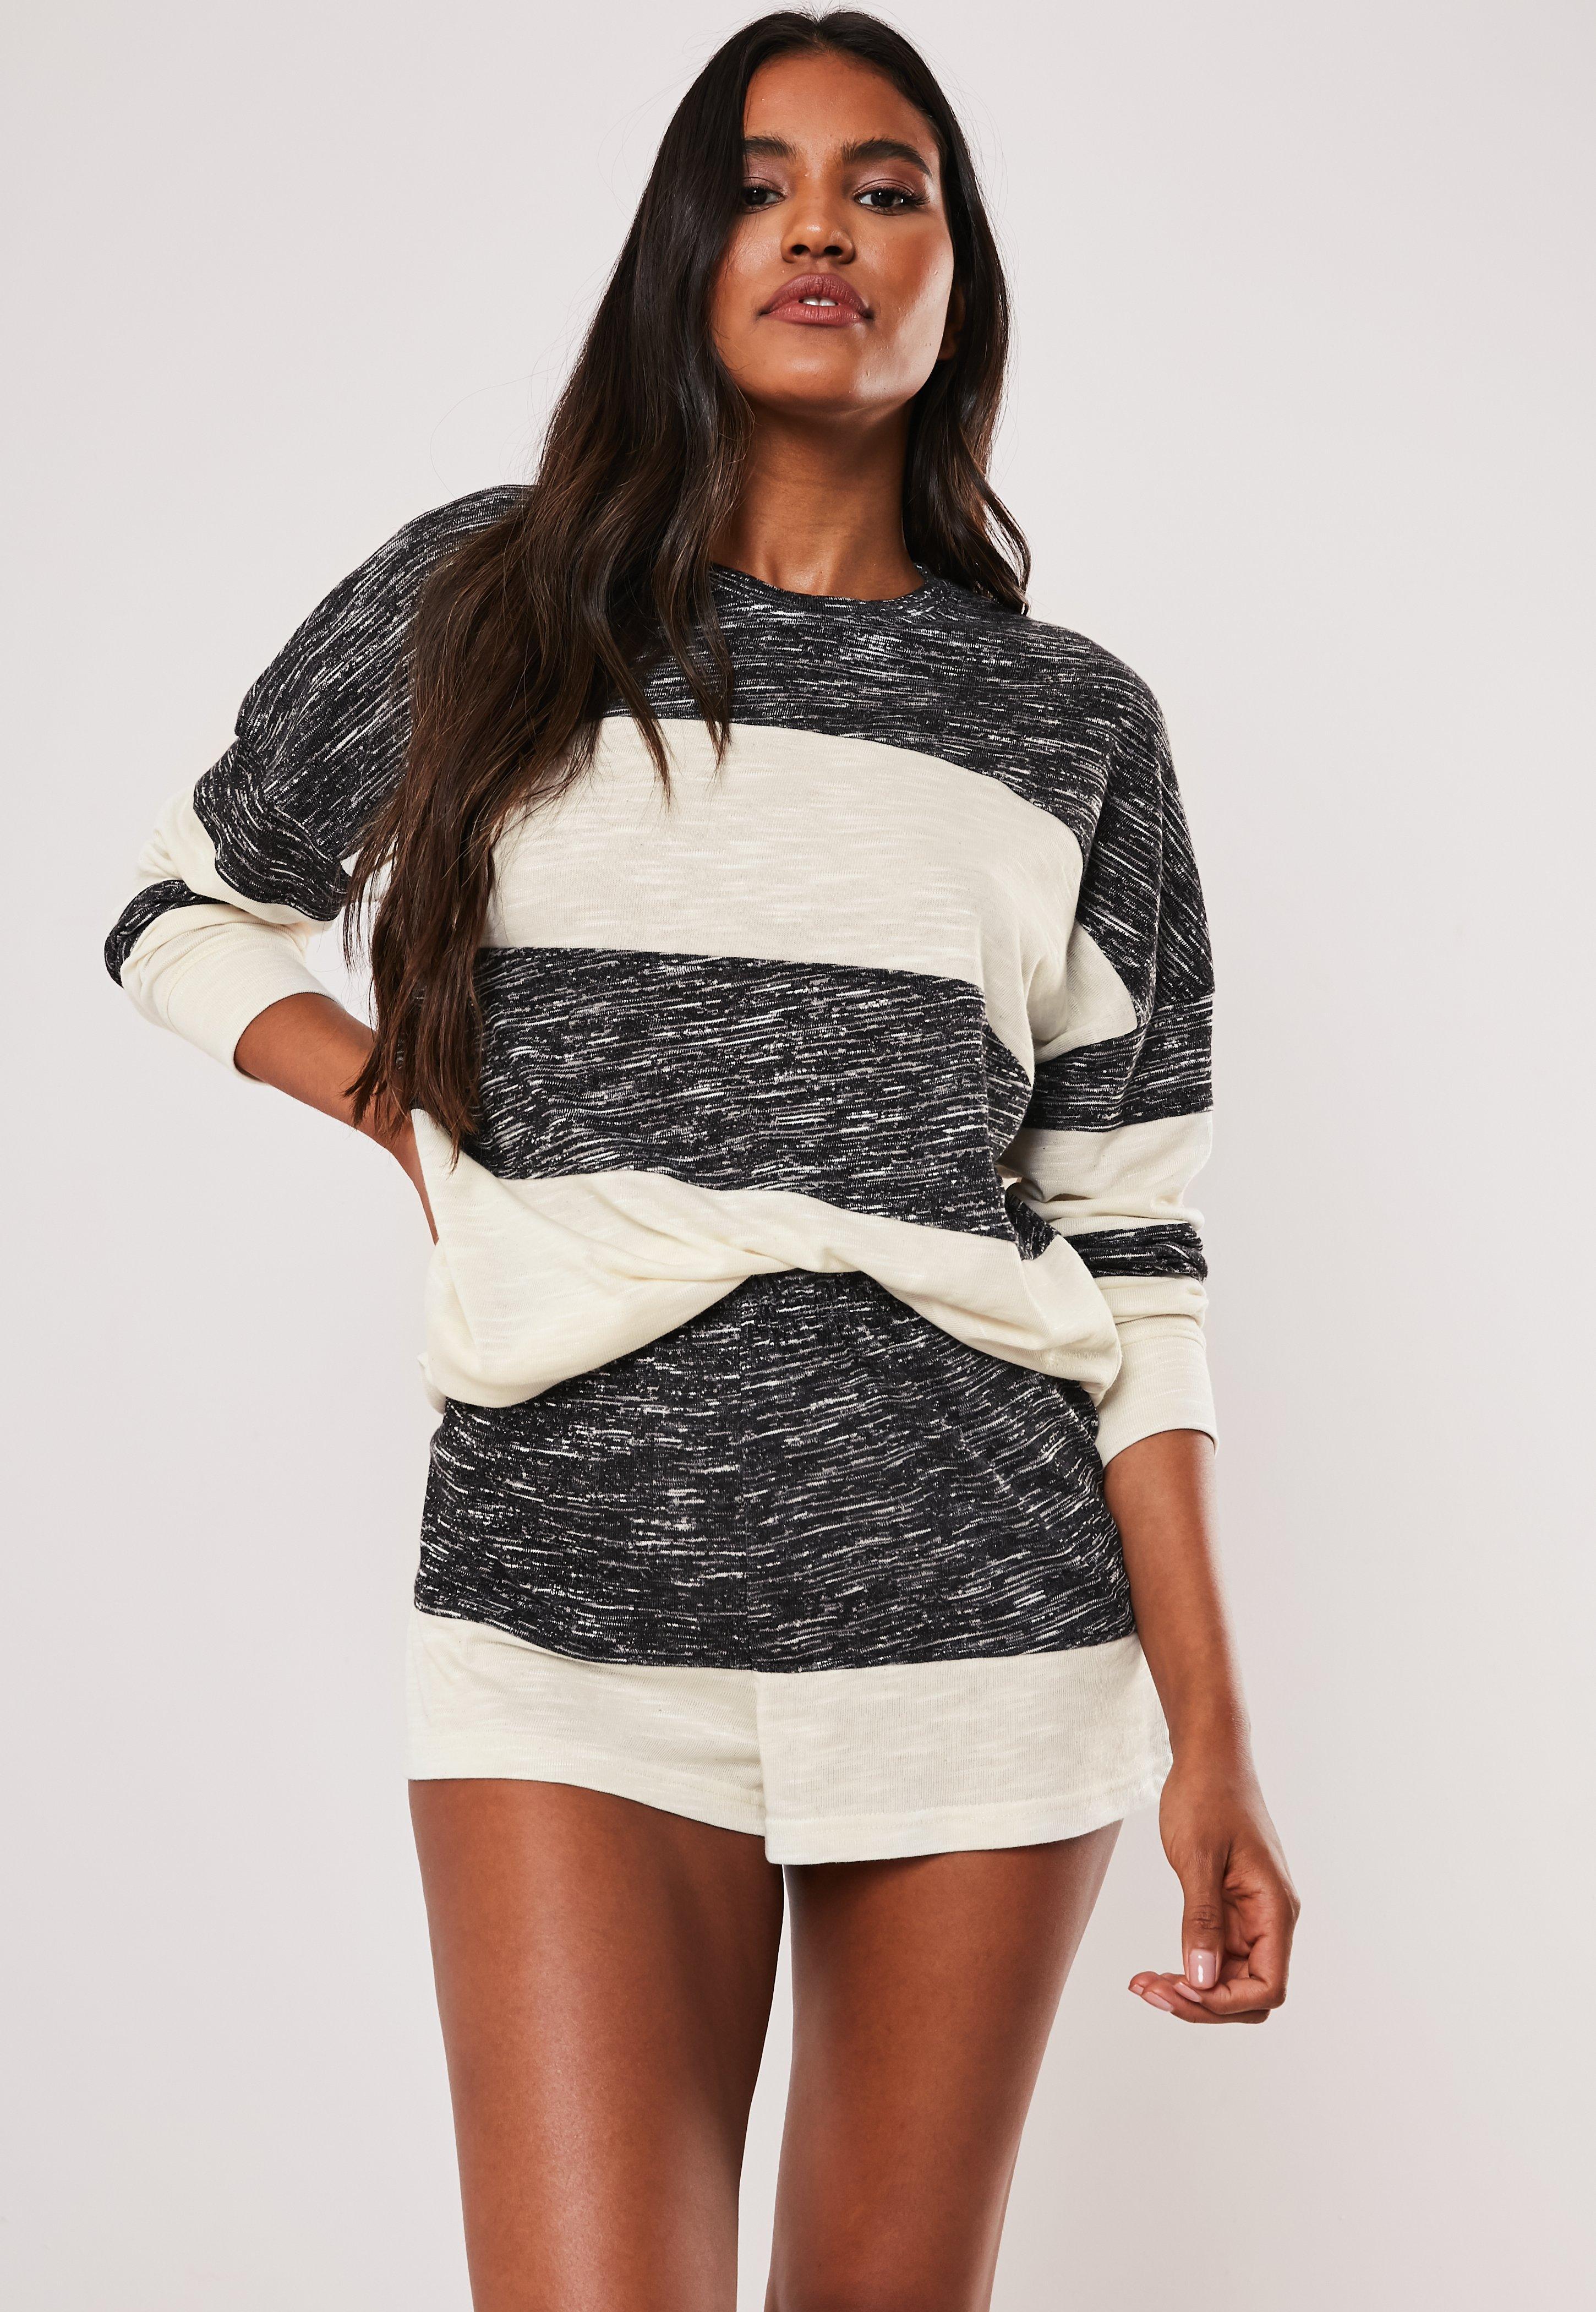 596bcc86f7 Grey Soft Knit Contrast Stripe Long Sleeve Top And Shorts Pyjama Set